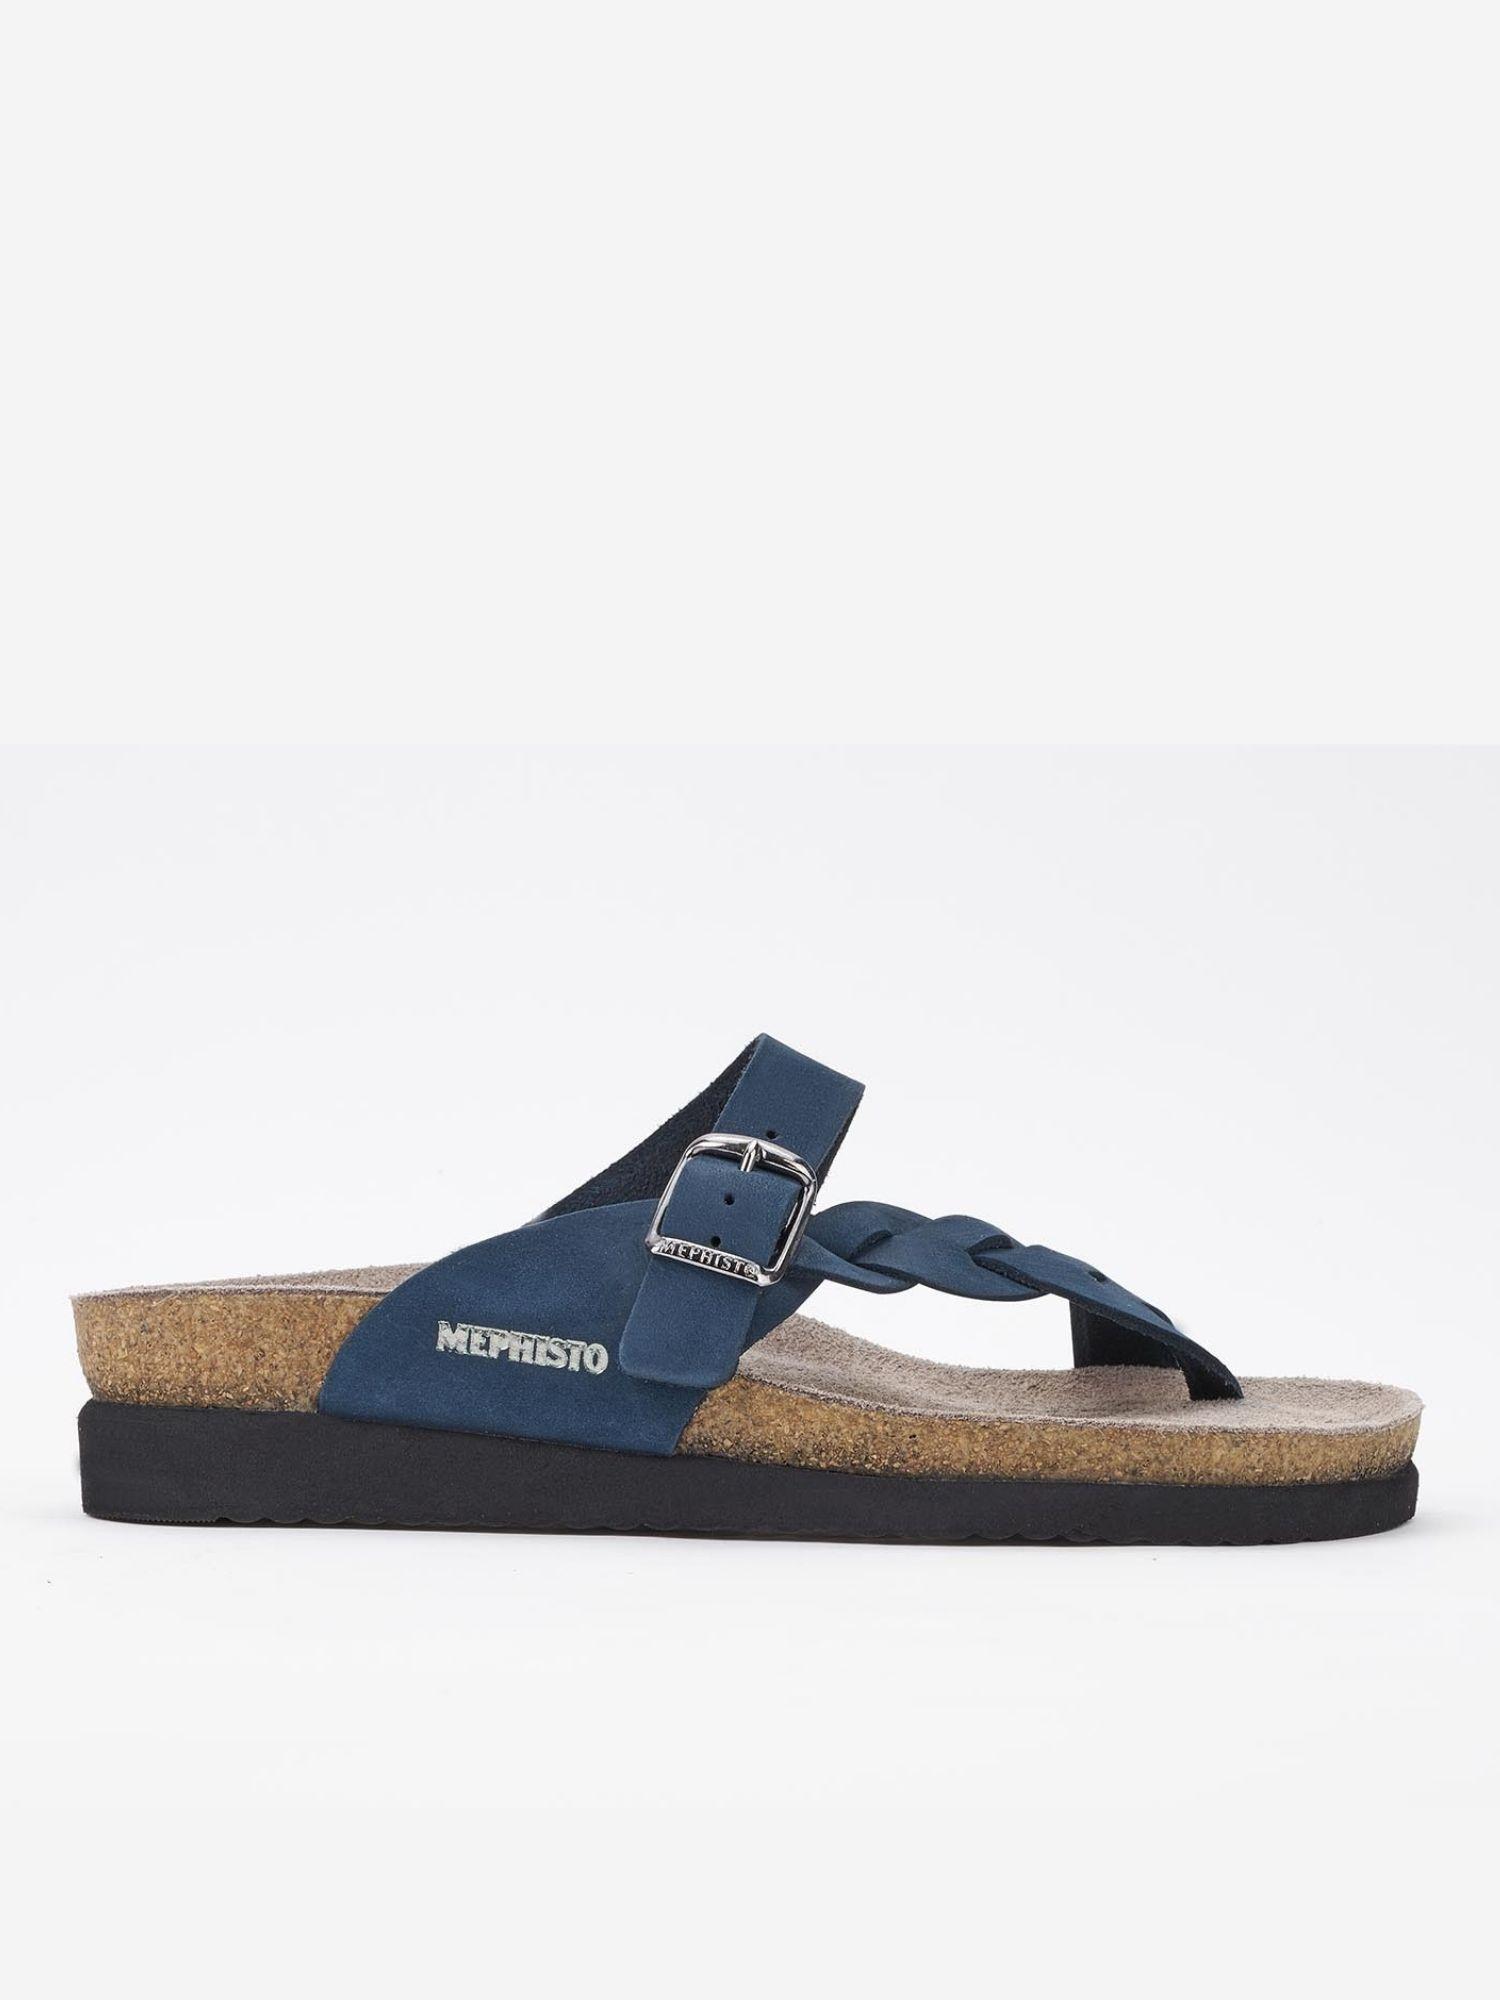 Sandalo Mephisto Helen Twist laterale